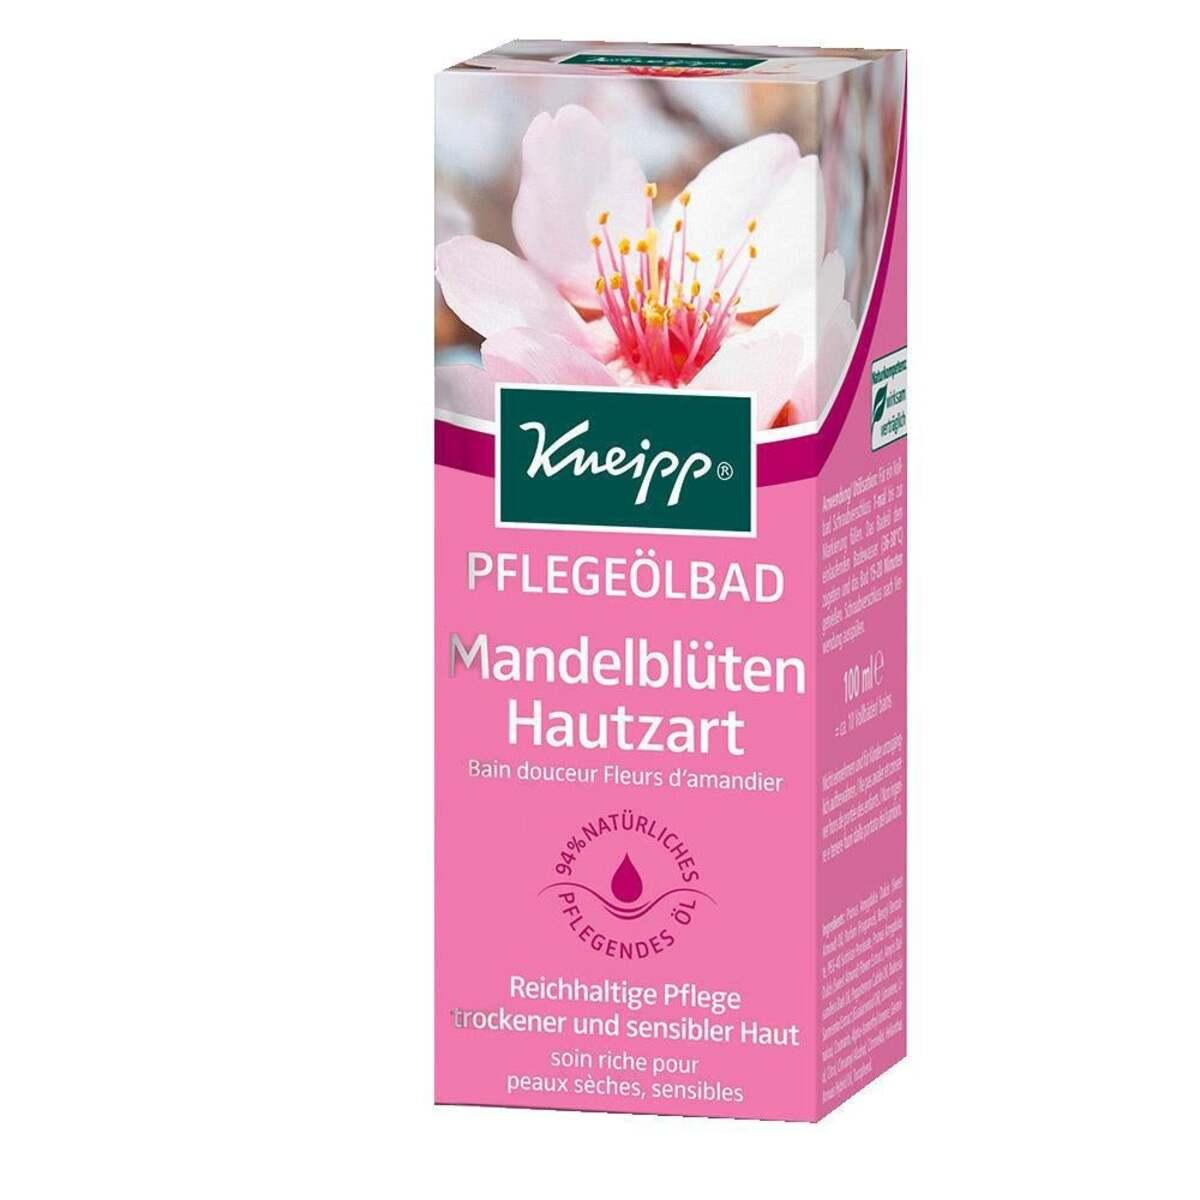 Bild 1 von Kneipp Pflegeölbad Mandelblüten Hautzart